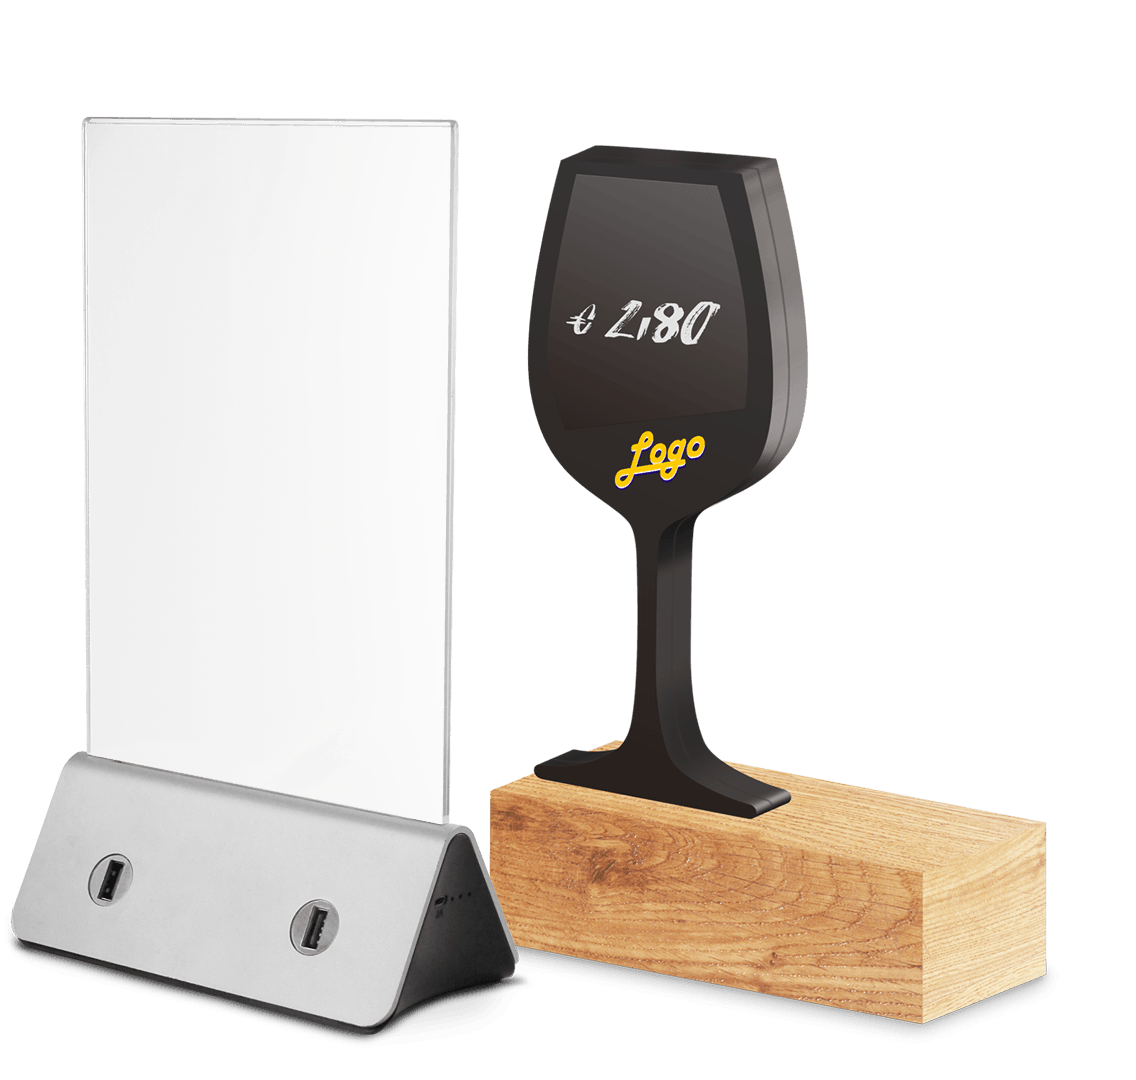 Menukartenhalter Menu Card Holder Powerbank Battery Batterie Aufladen loading charge Charging Station USB